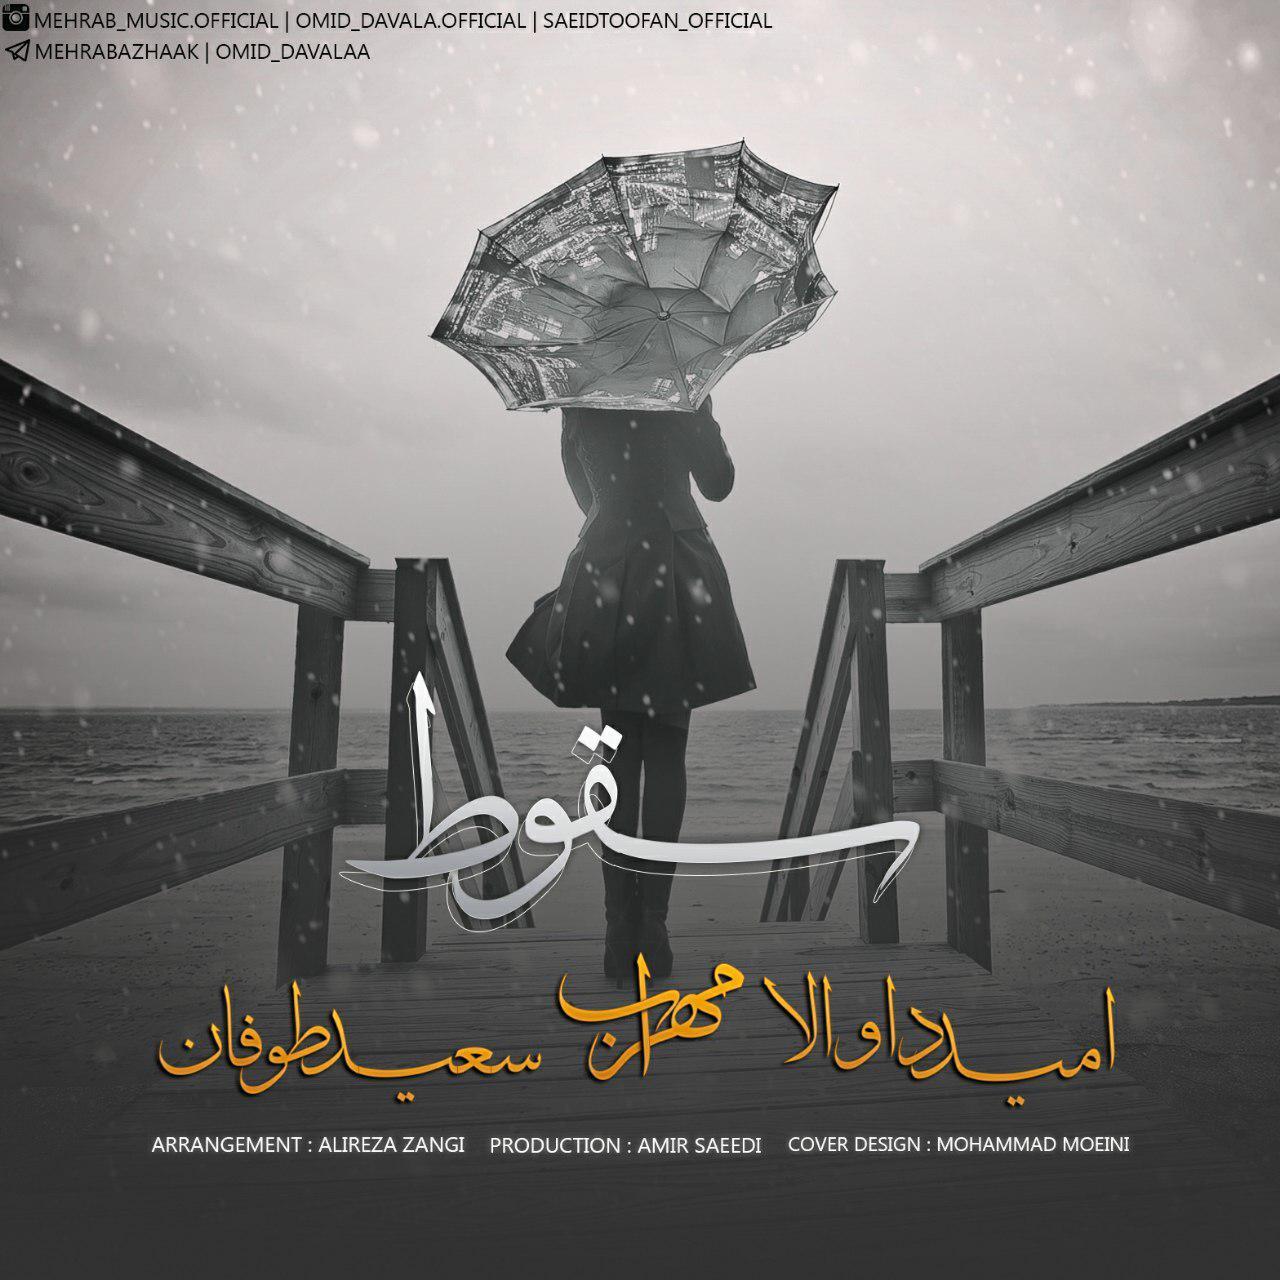 http://rozup.ir/view/1788478/Mehrab-Omid-Davala-Saeid-Toofan-Soghoot.jpg